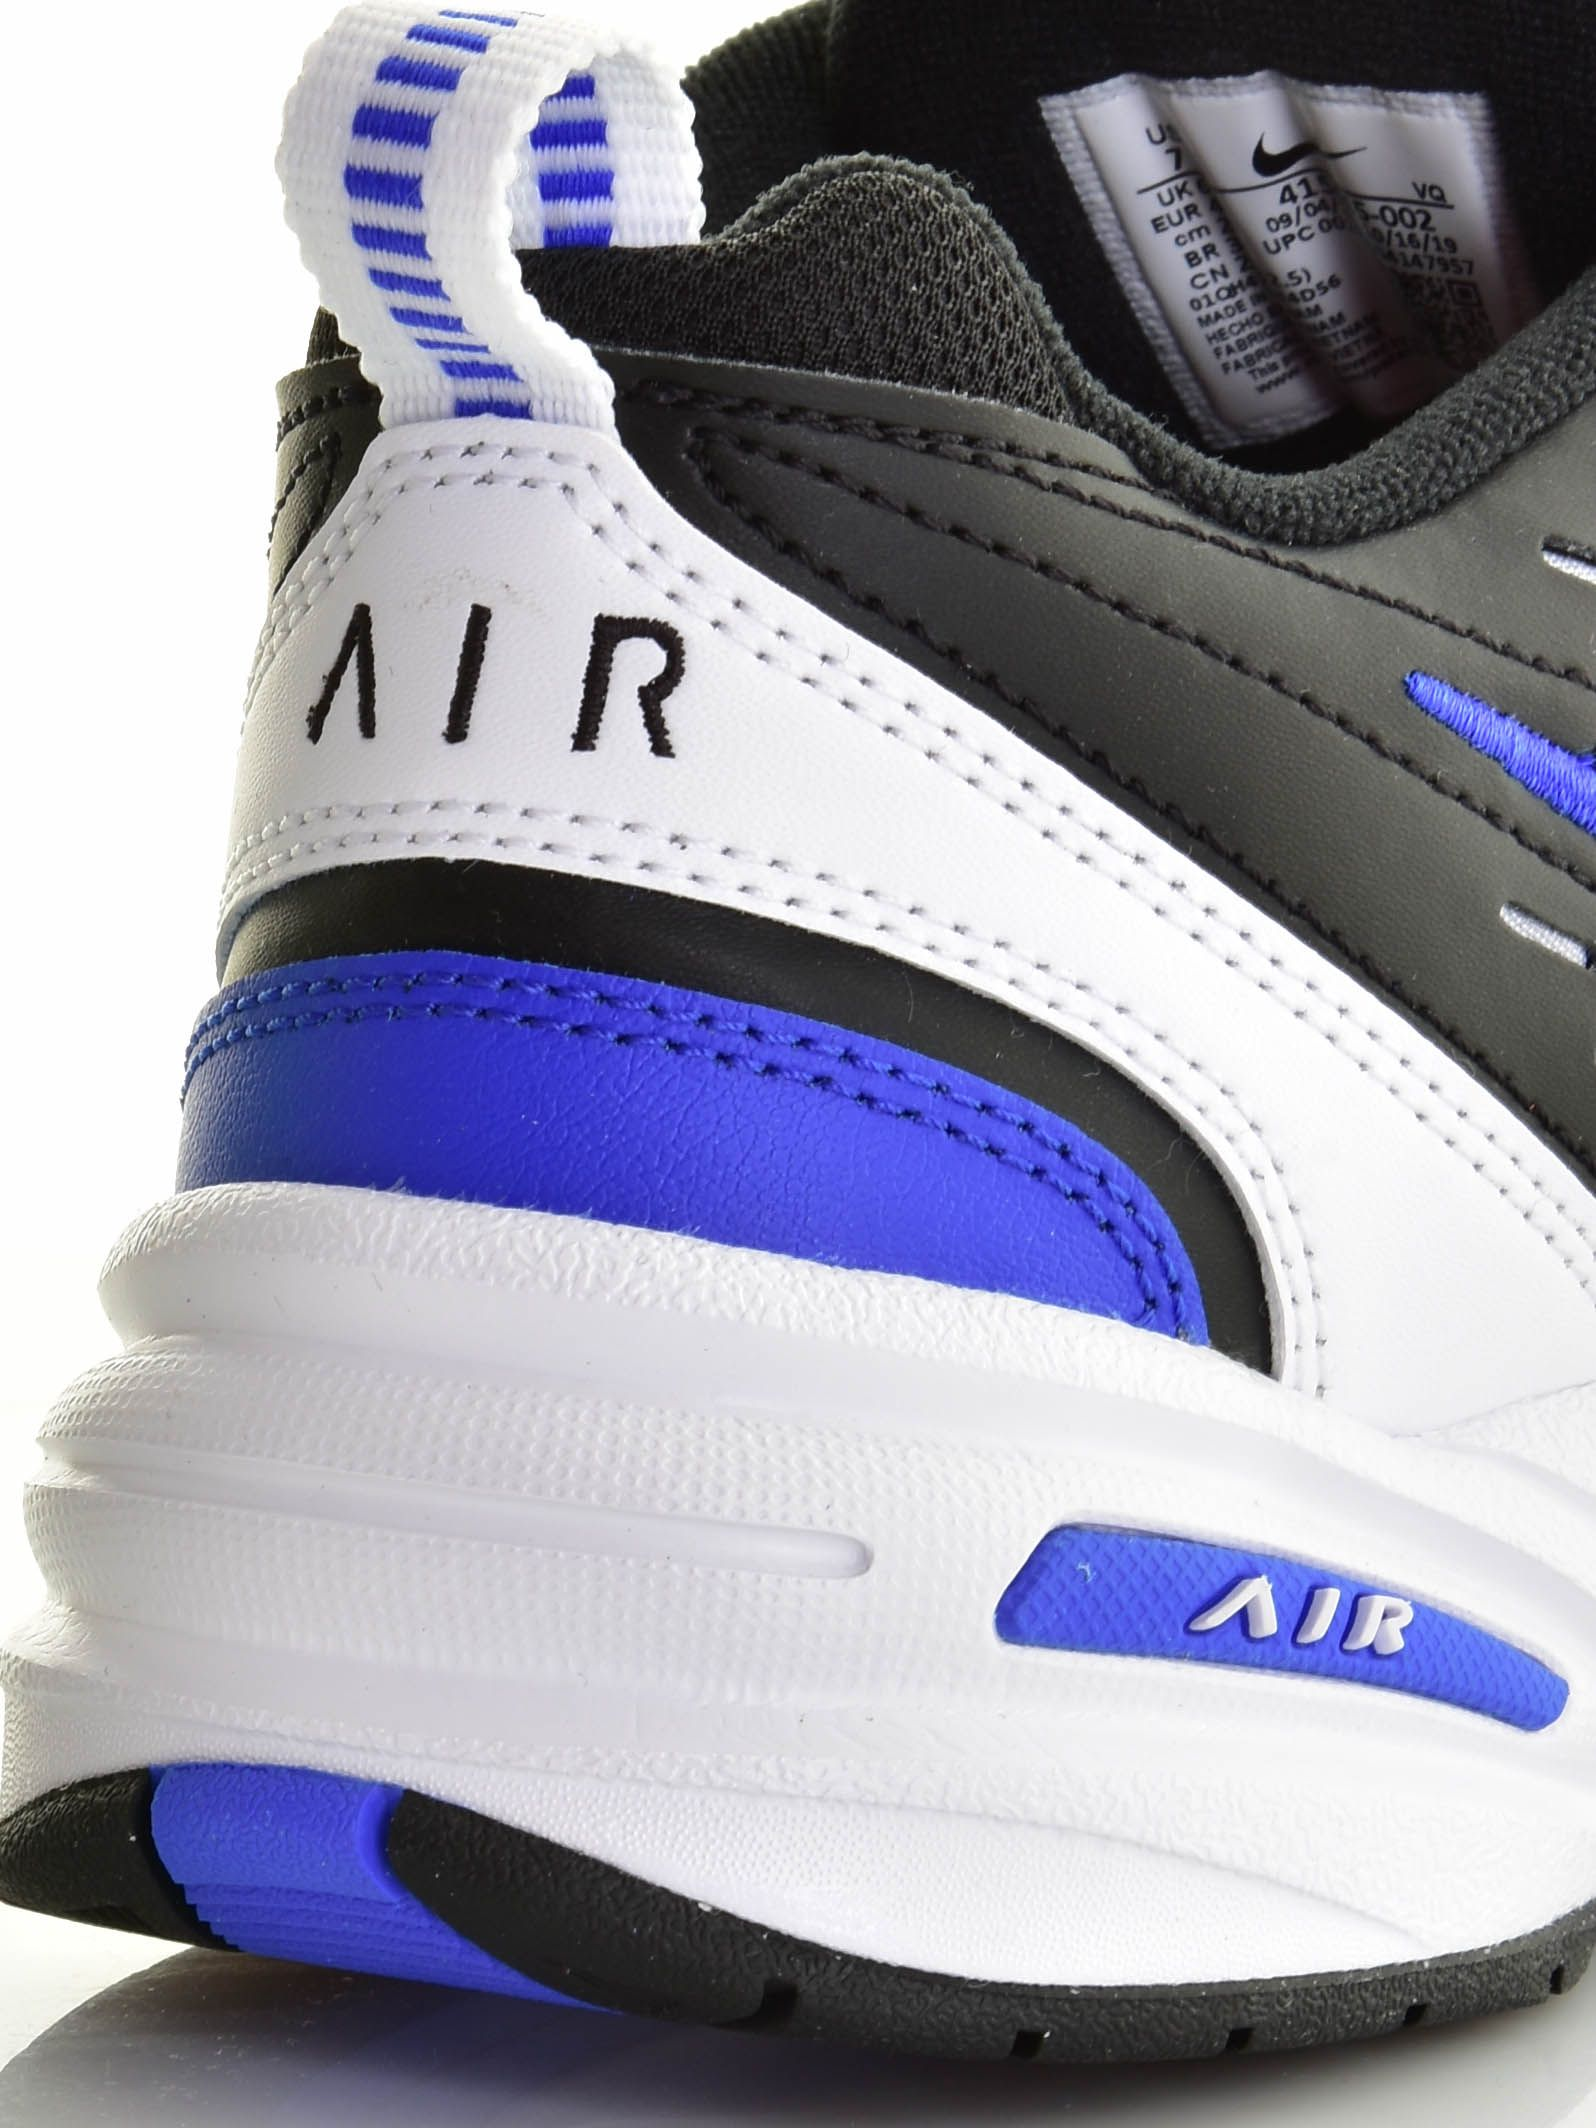 Nike férfi cipő AIR MONARCH IV   Markasbolt.hu Hivatalos